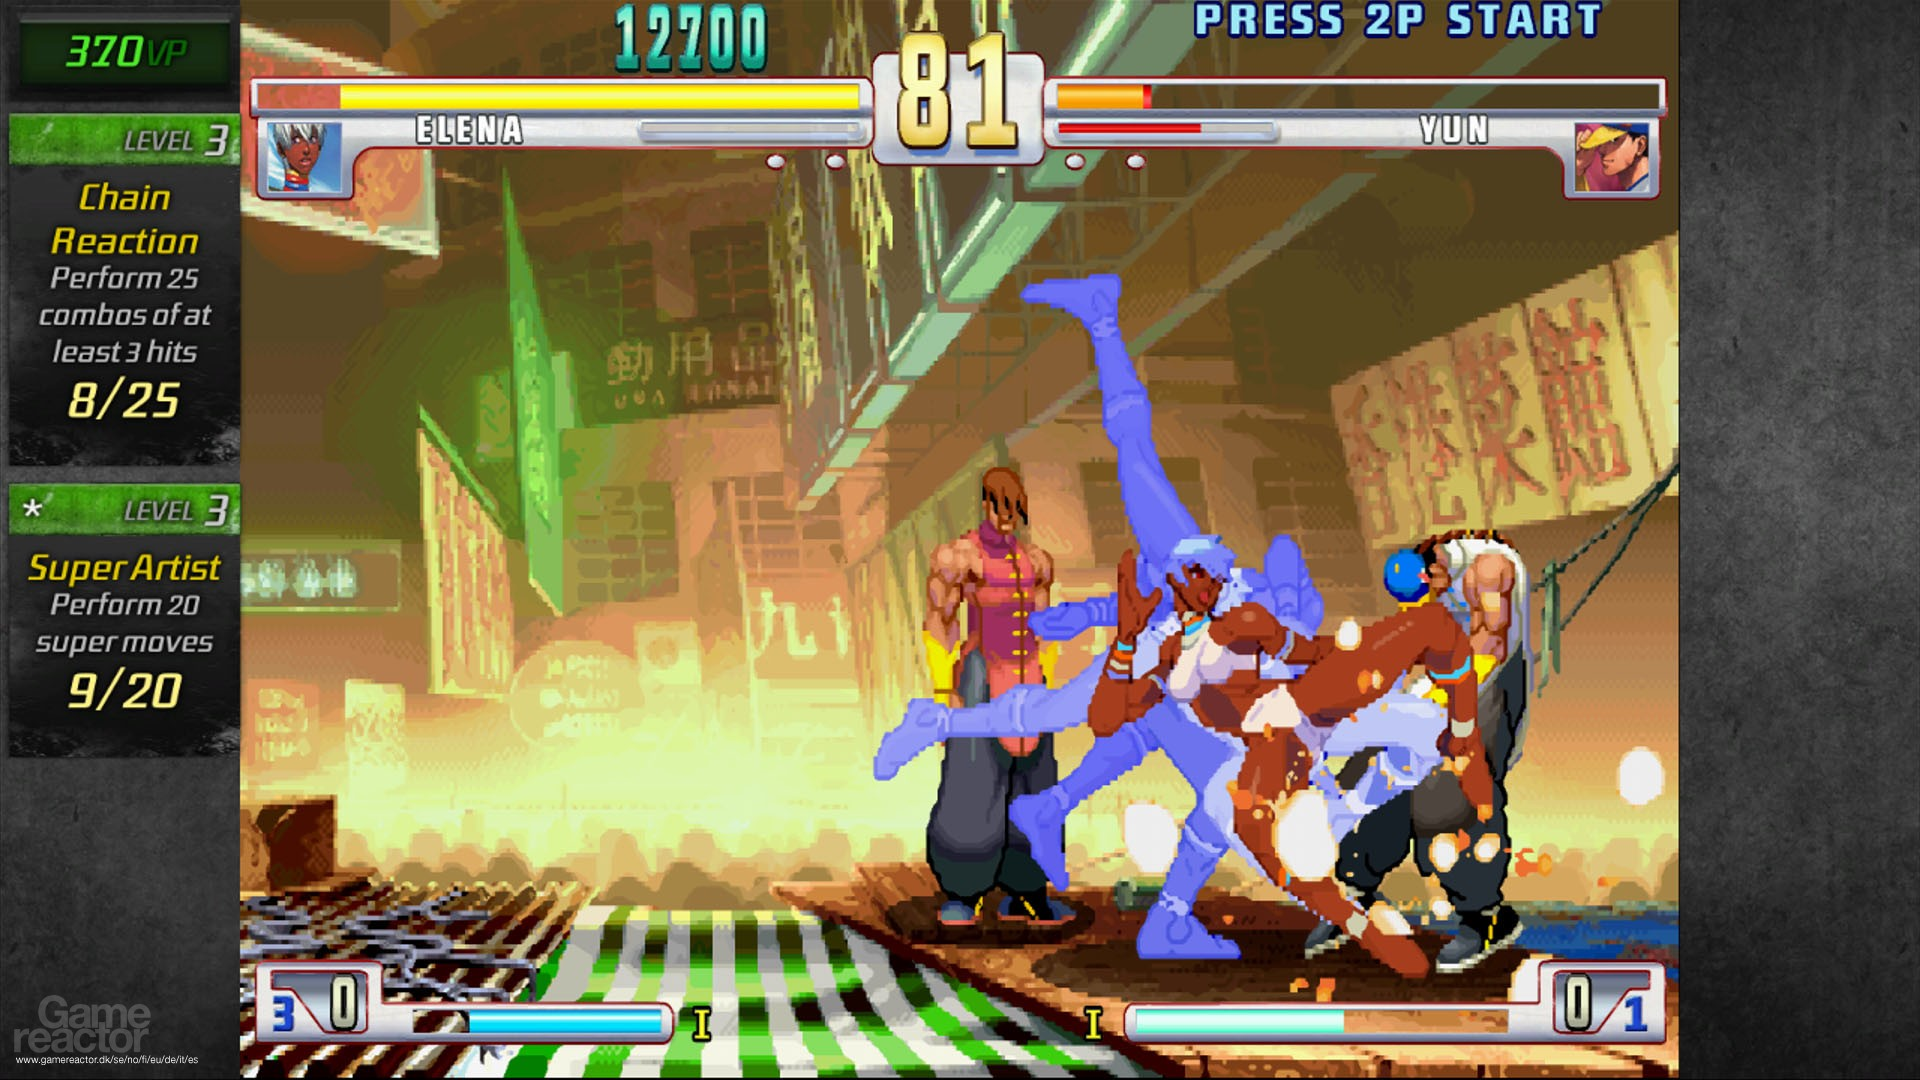 Street fighter 3: third strike online edition demo (ps3) youtube.